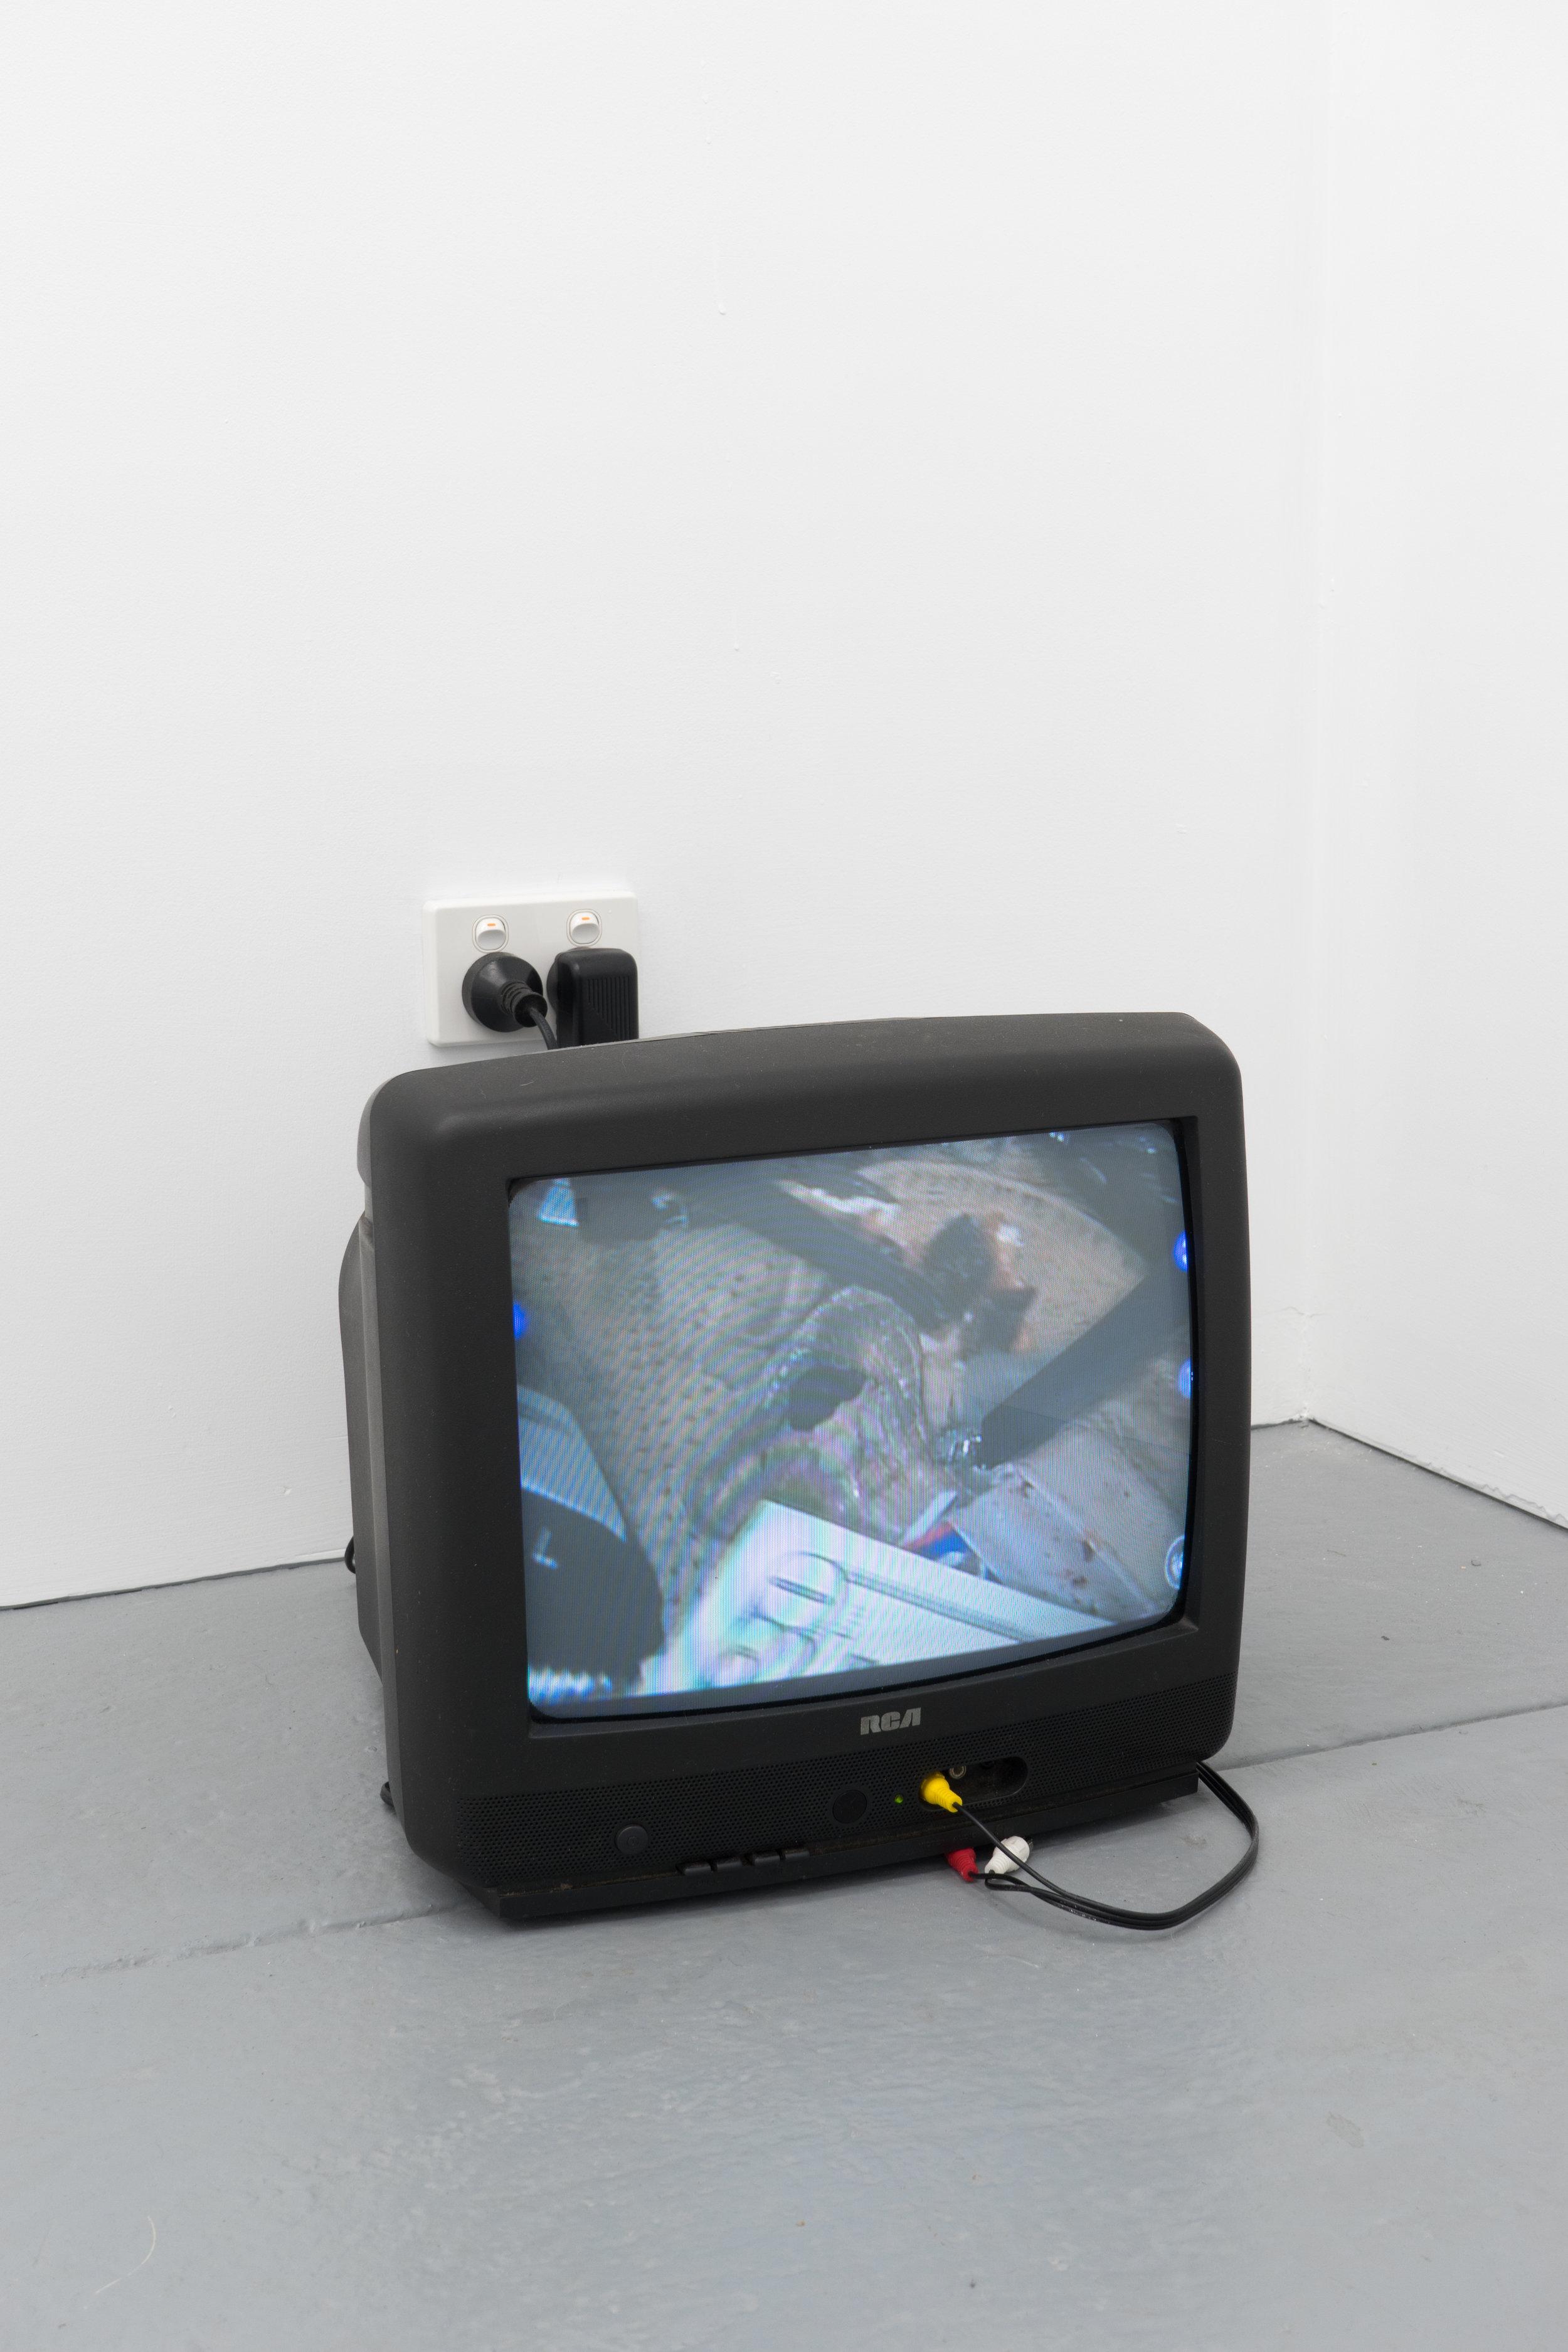 Liz Magic Laser, Mine, 2009 Single-channel video, 22 minutes. Produced with the Leonardo da Vinci surgical system  Image credit: Ruben Bull-milne